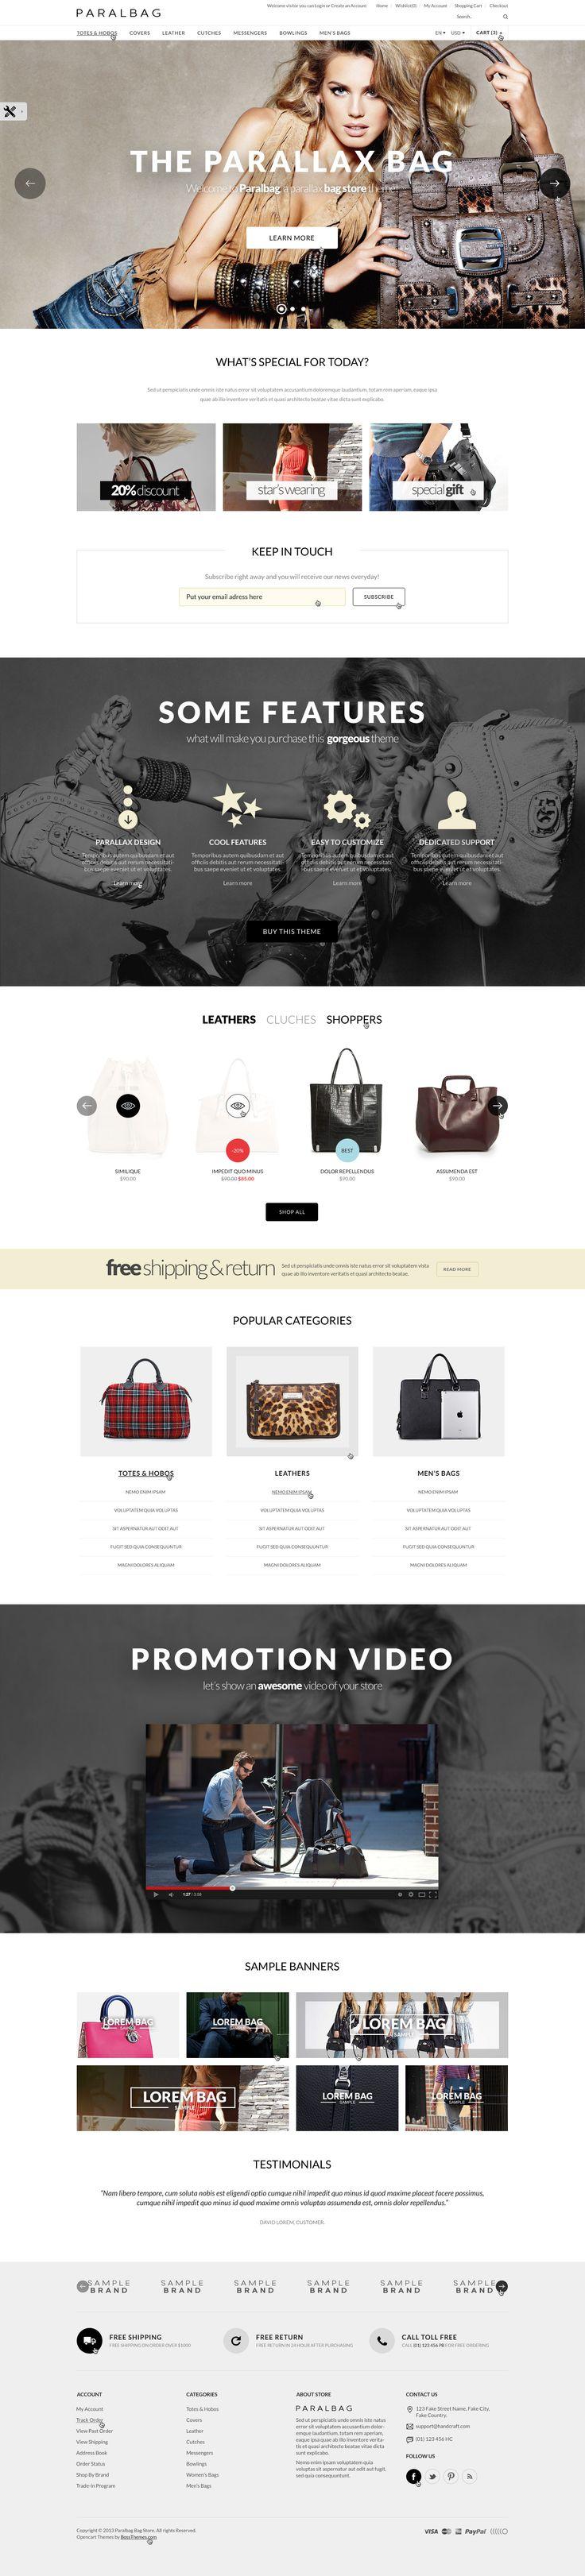 Paralbag. #webdesign #it #web #design #layout #userinterface ...